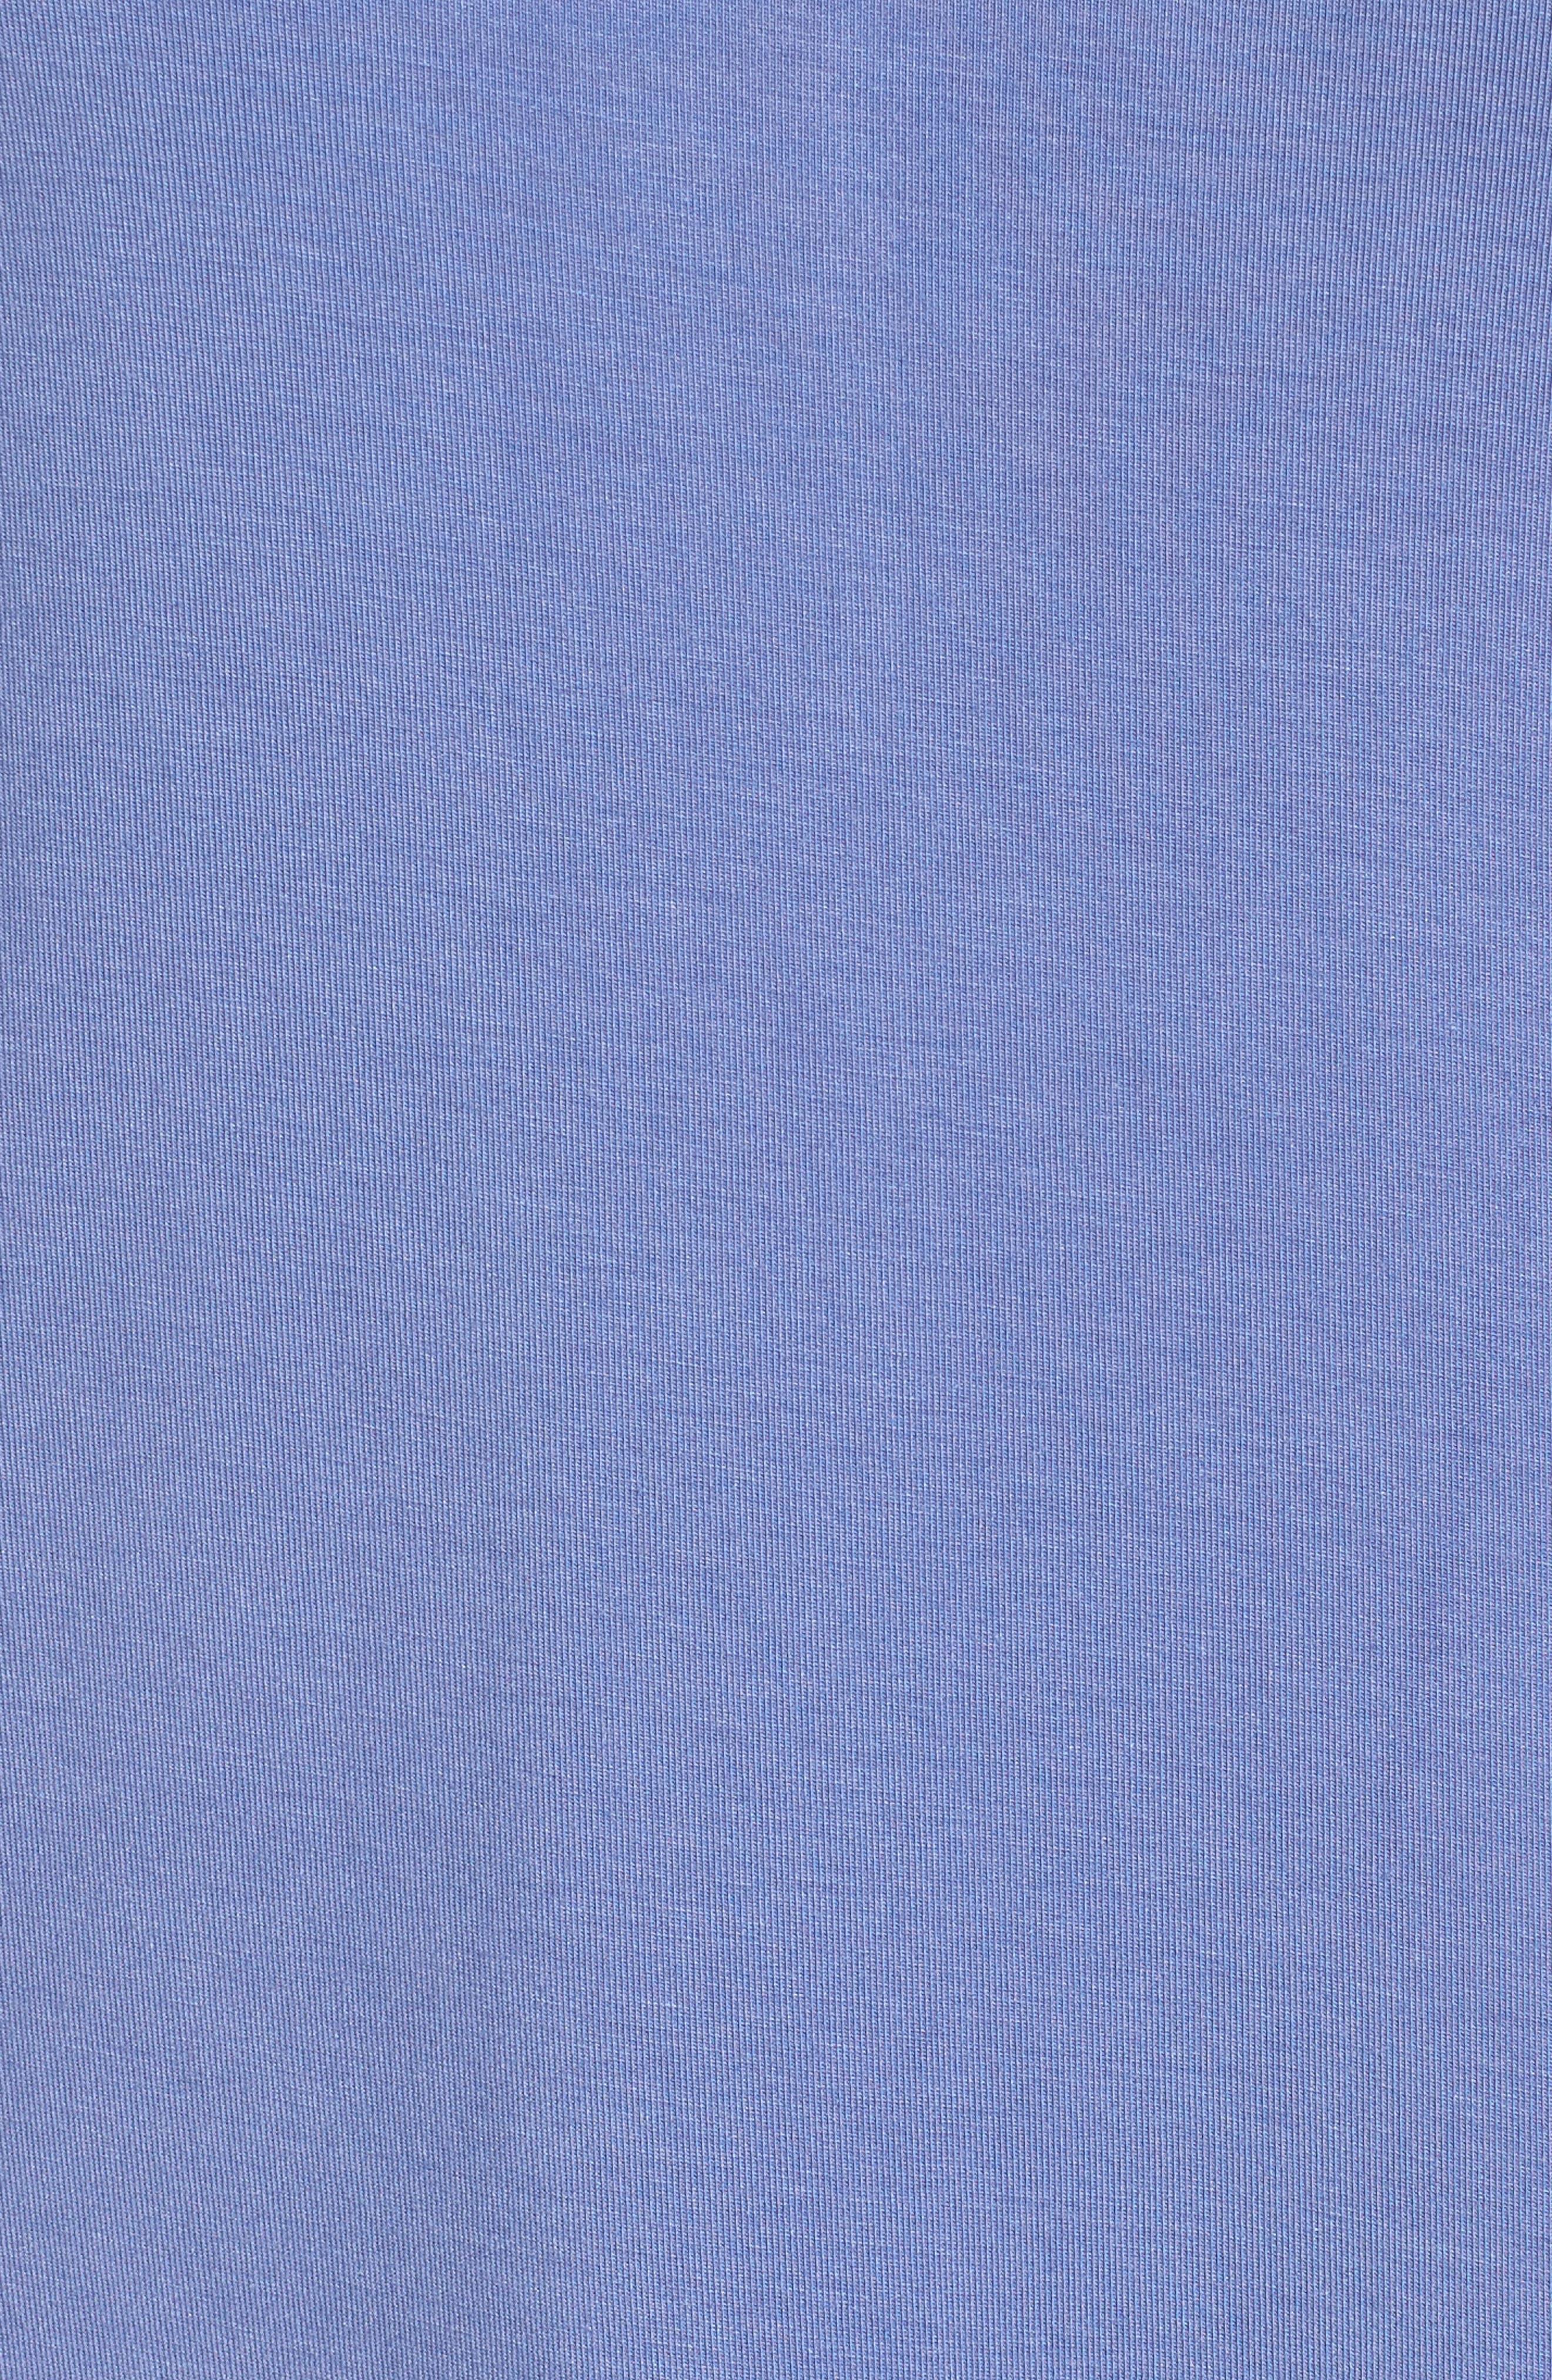 Dolman Sleeve Nightshirt,                             Alternate thumbnail 5, color,                             Blue Denim